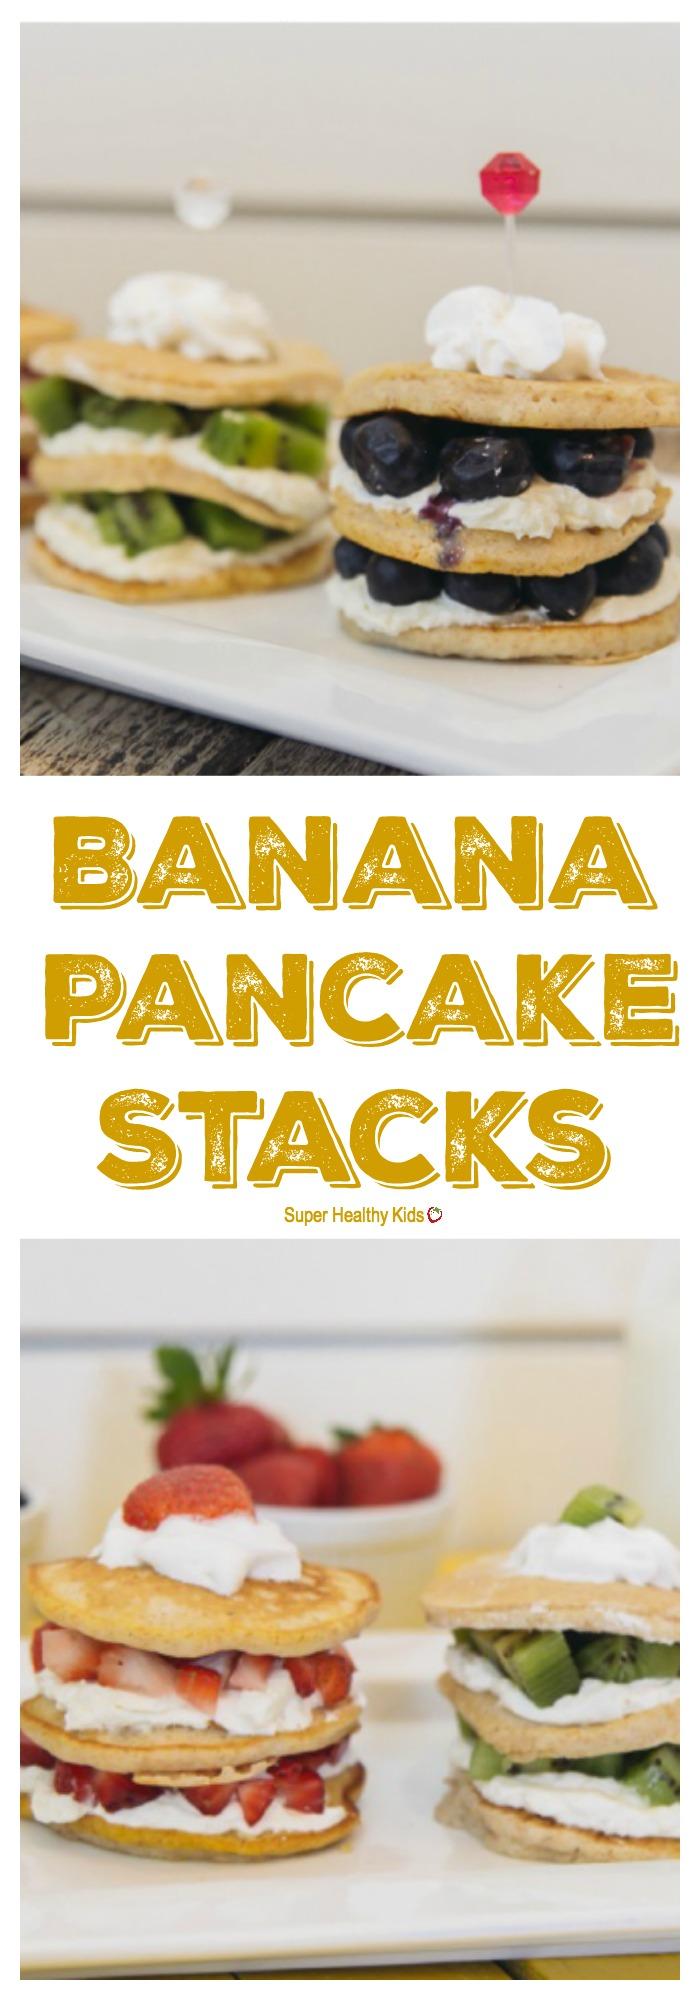 FOOD - Banana Pancake Stacks. These pancake stacks make the perfect birthday (or any day) breakfast! http://www.superhealthykids.com/banana-pancake-stacks/